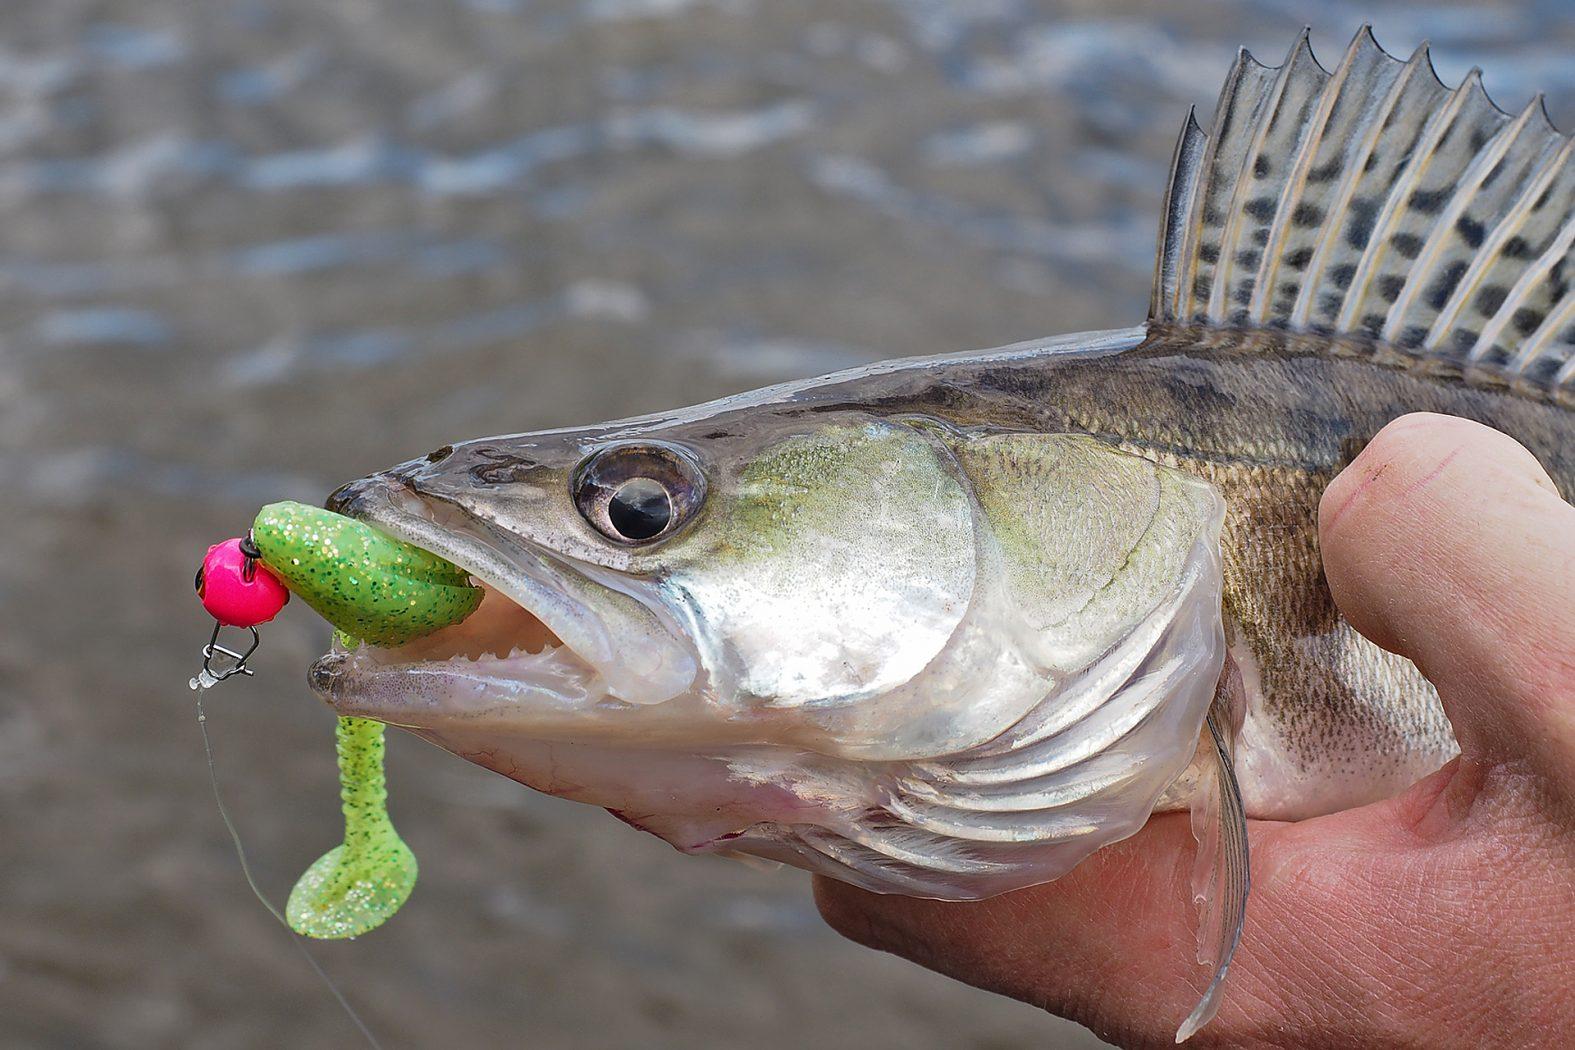 Zander angeln mit Cheburashka Jig